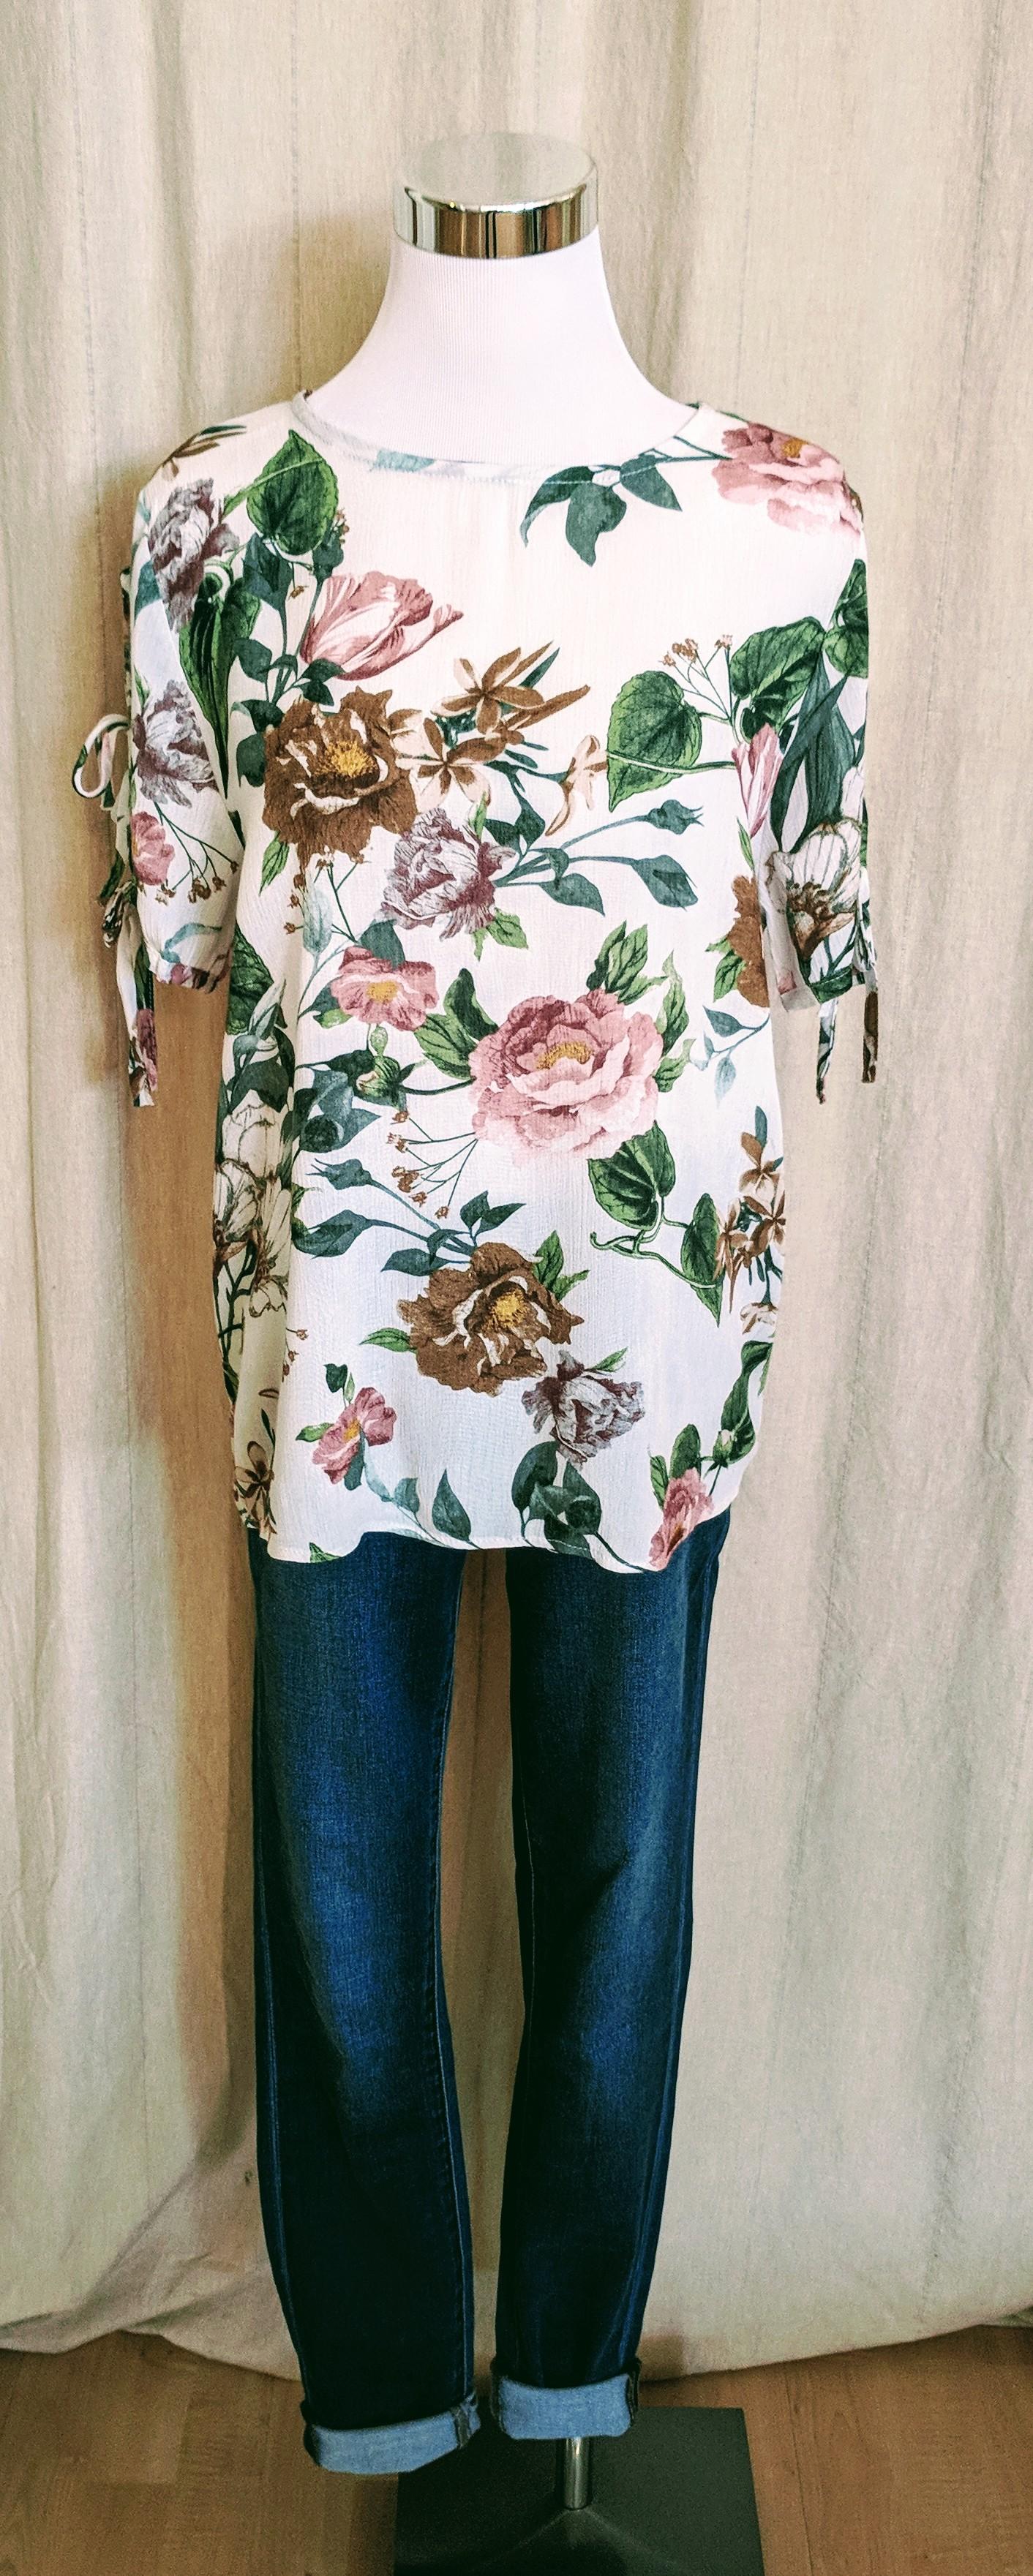 Short sleeve Vintage Floral top with Tie Detail on sleeve $32